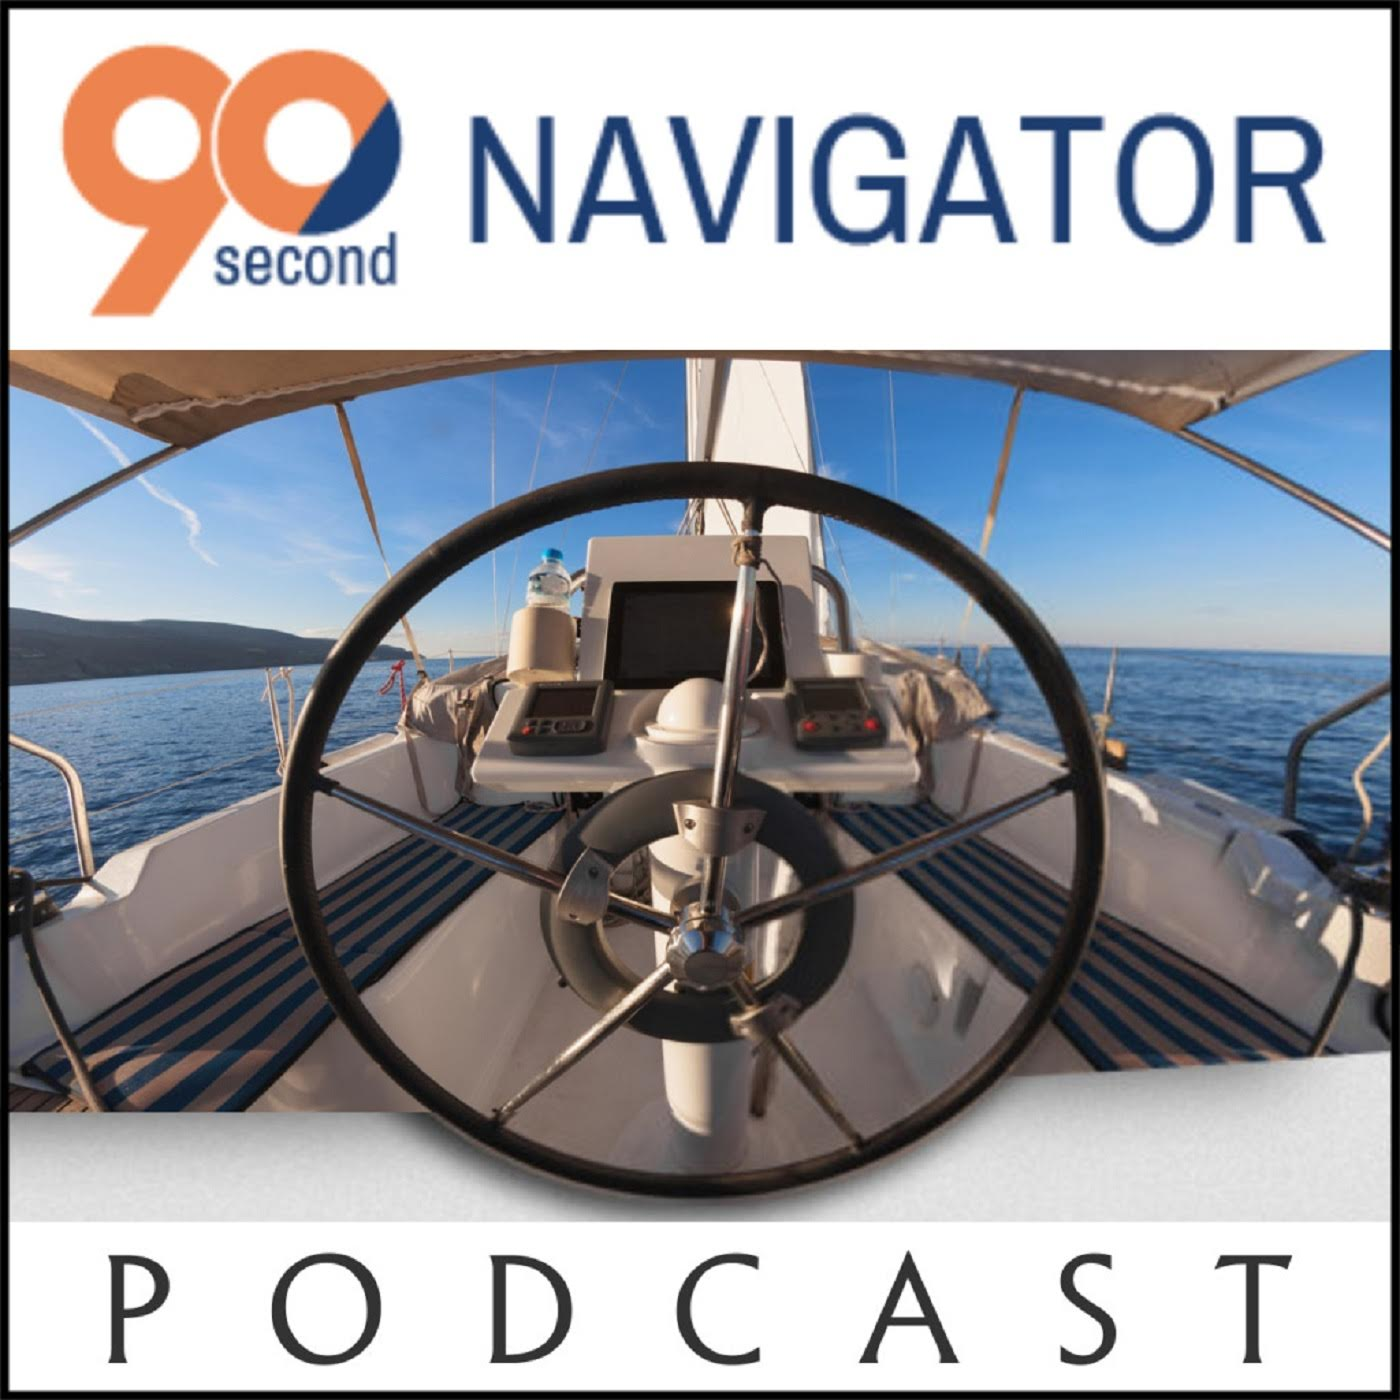 90 Second Navigator with Joel Brookman